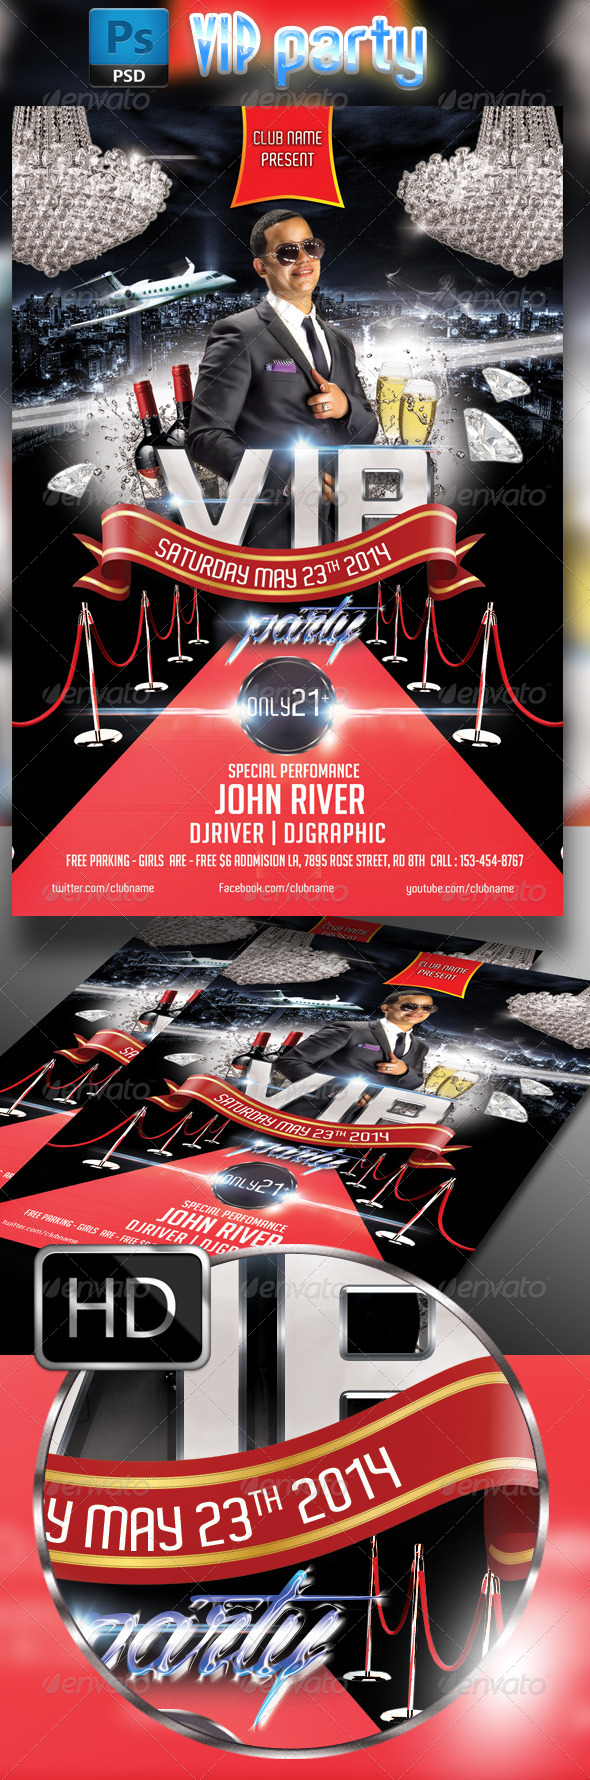 GraphicRiver VIP party 7618055